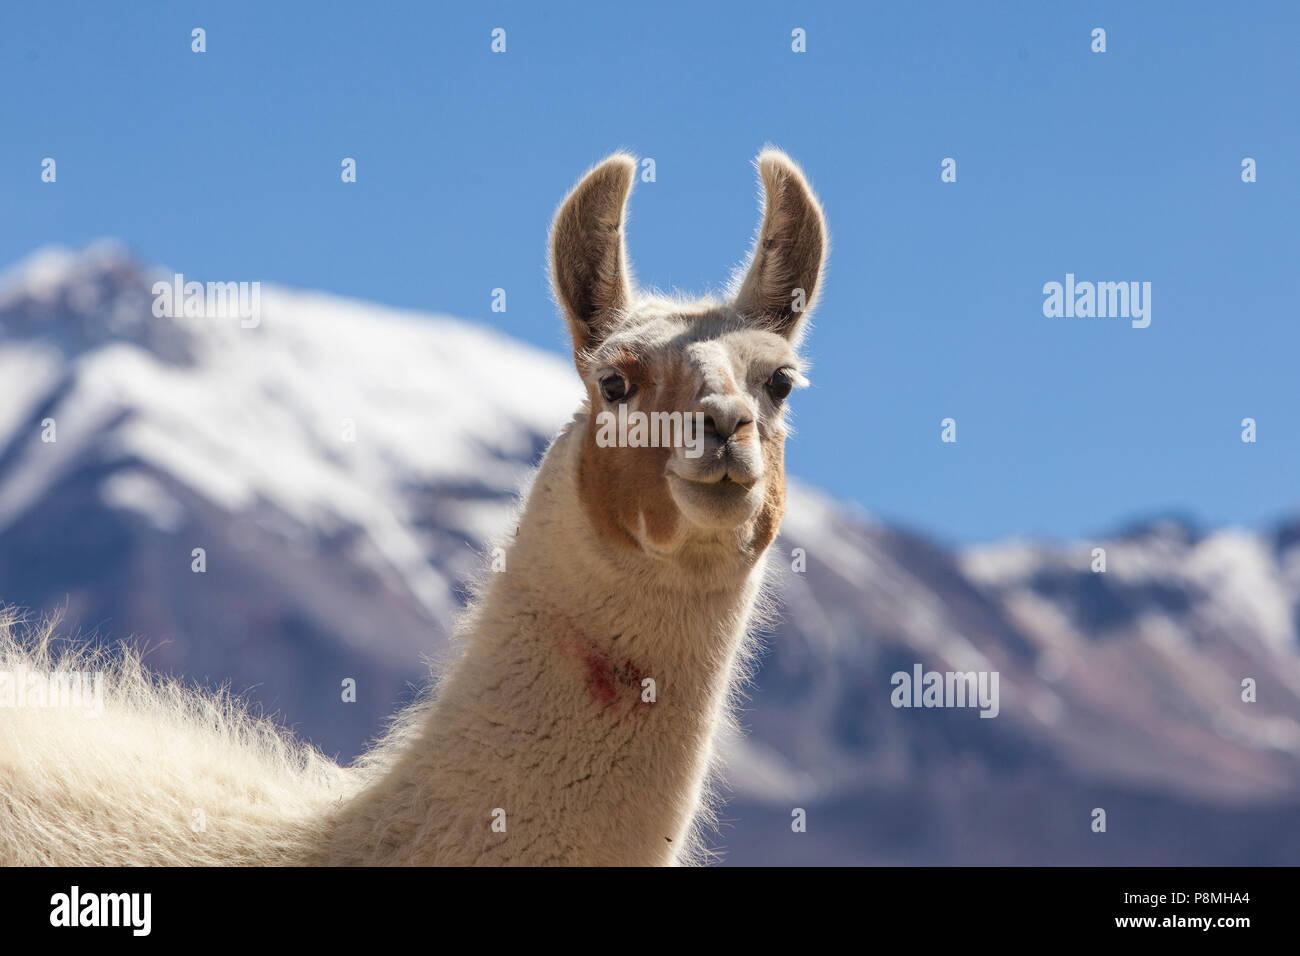 Alpaca (Lama pacos) portrait - Stock Image